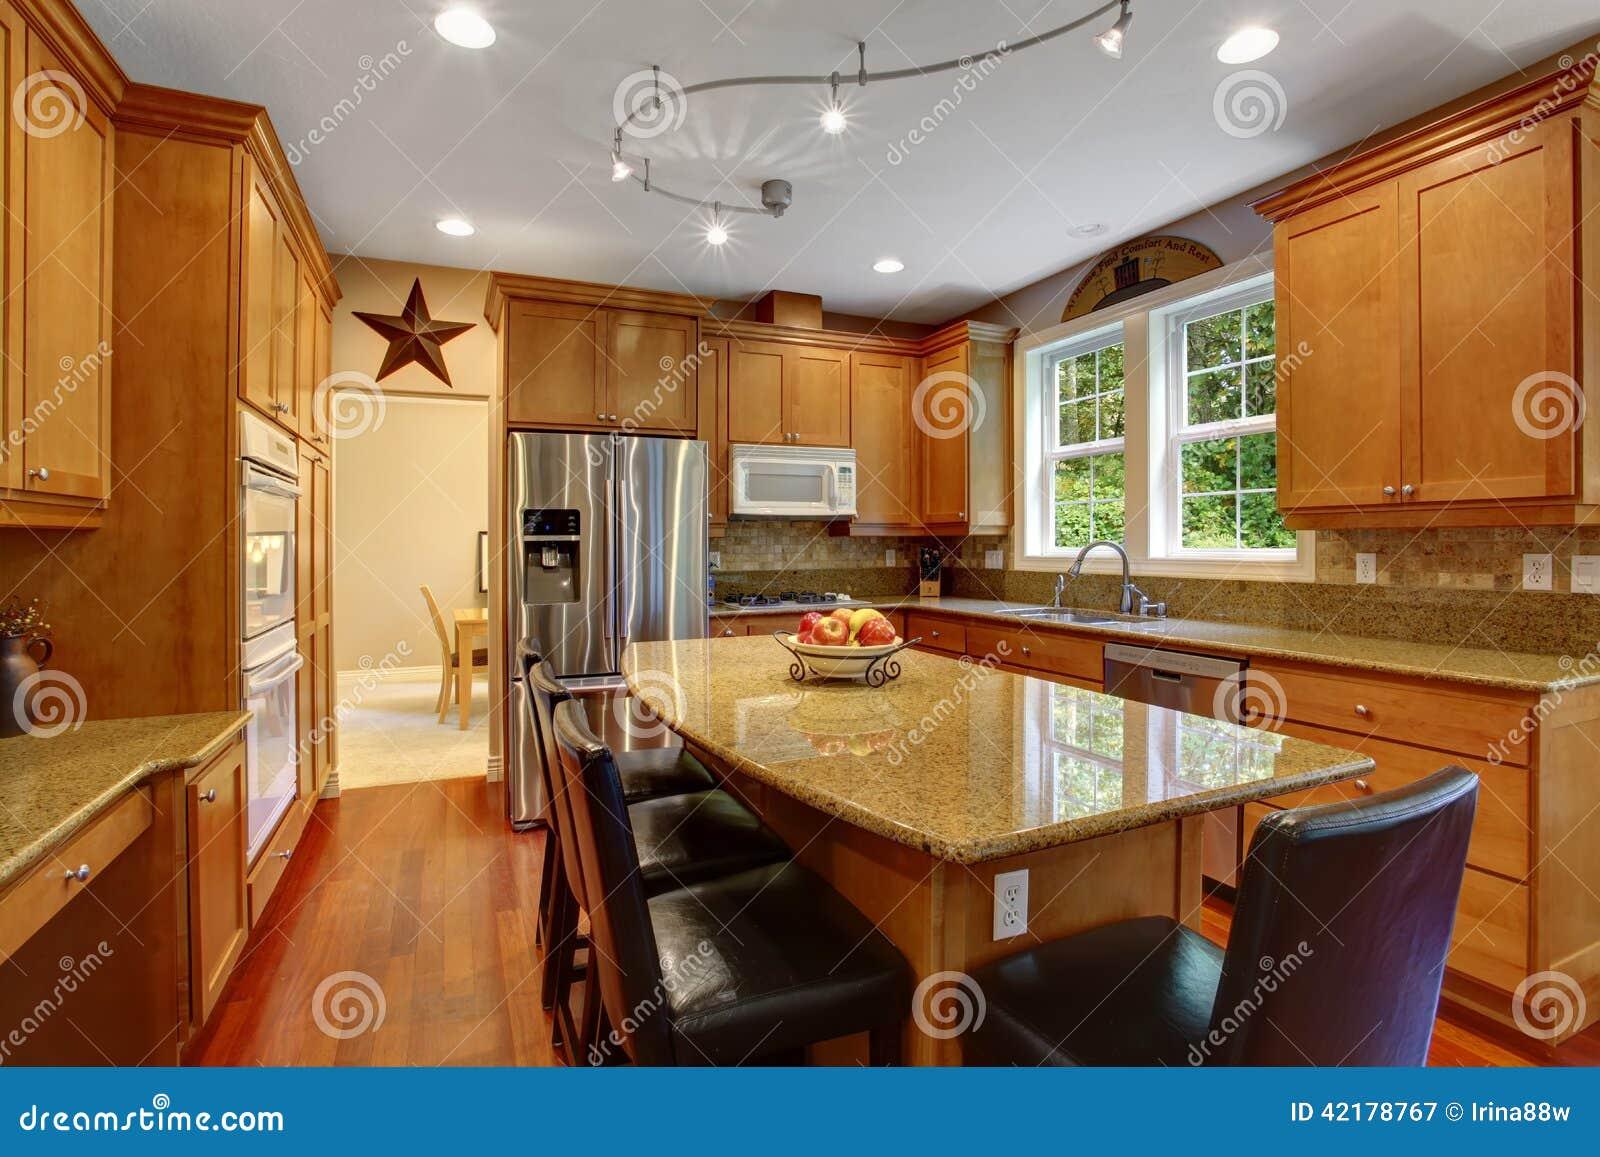 House Interior Elegant Kitchen Room Interior Stock Photo Image